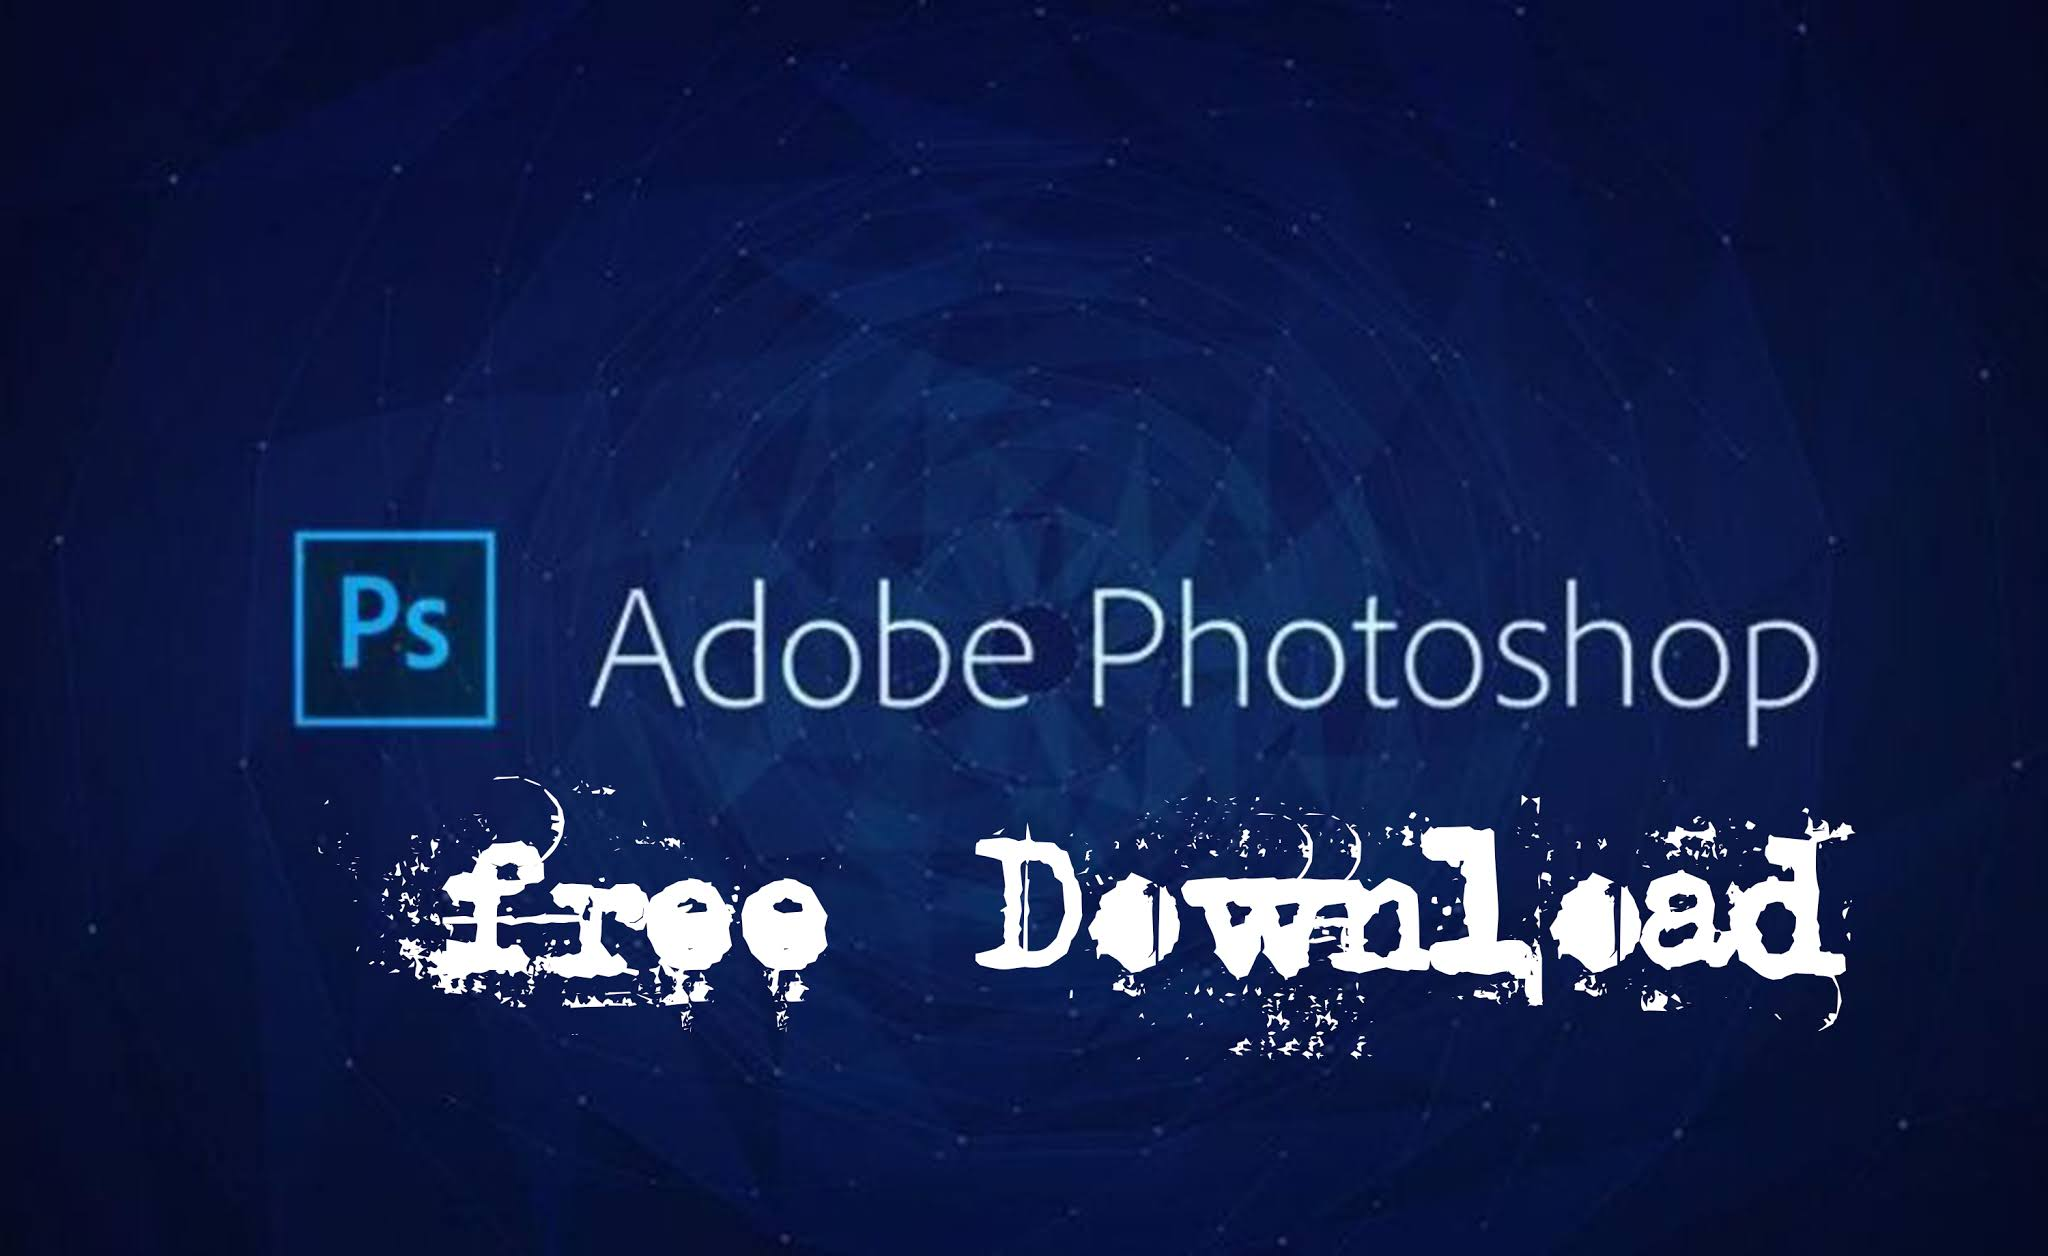 All type hacks adobe photoshop cs6 download for windows 10